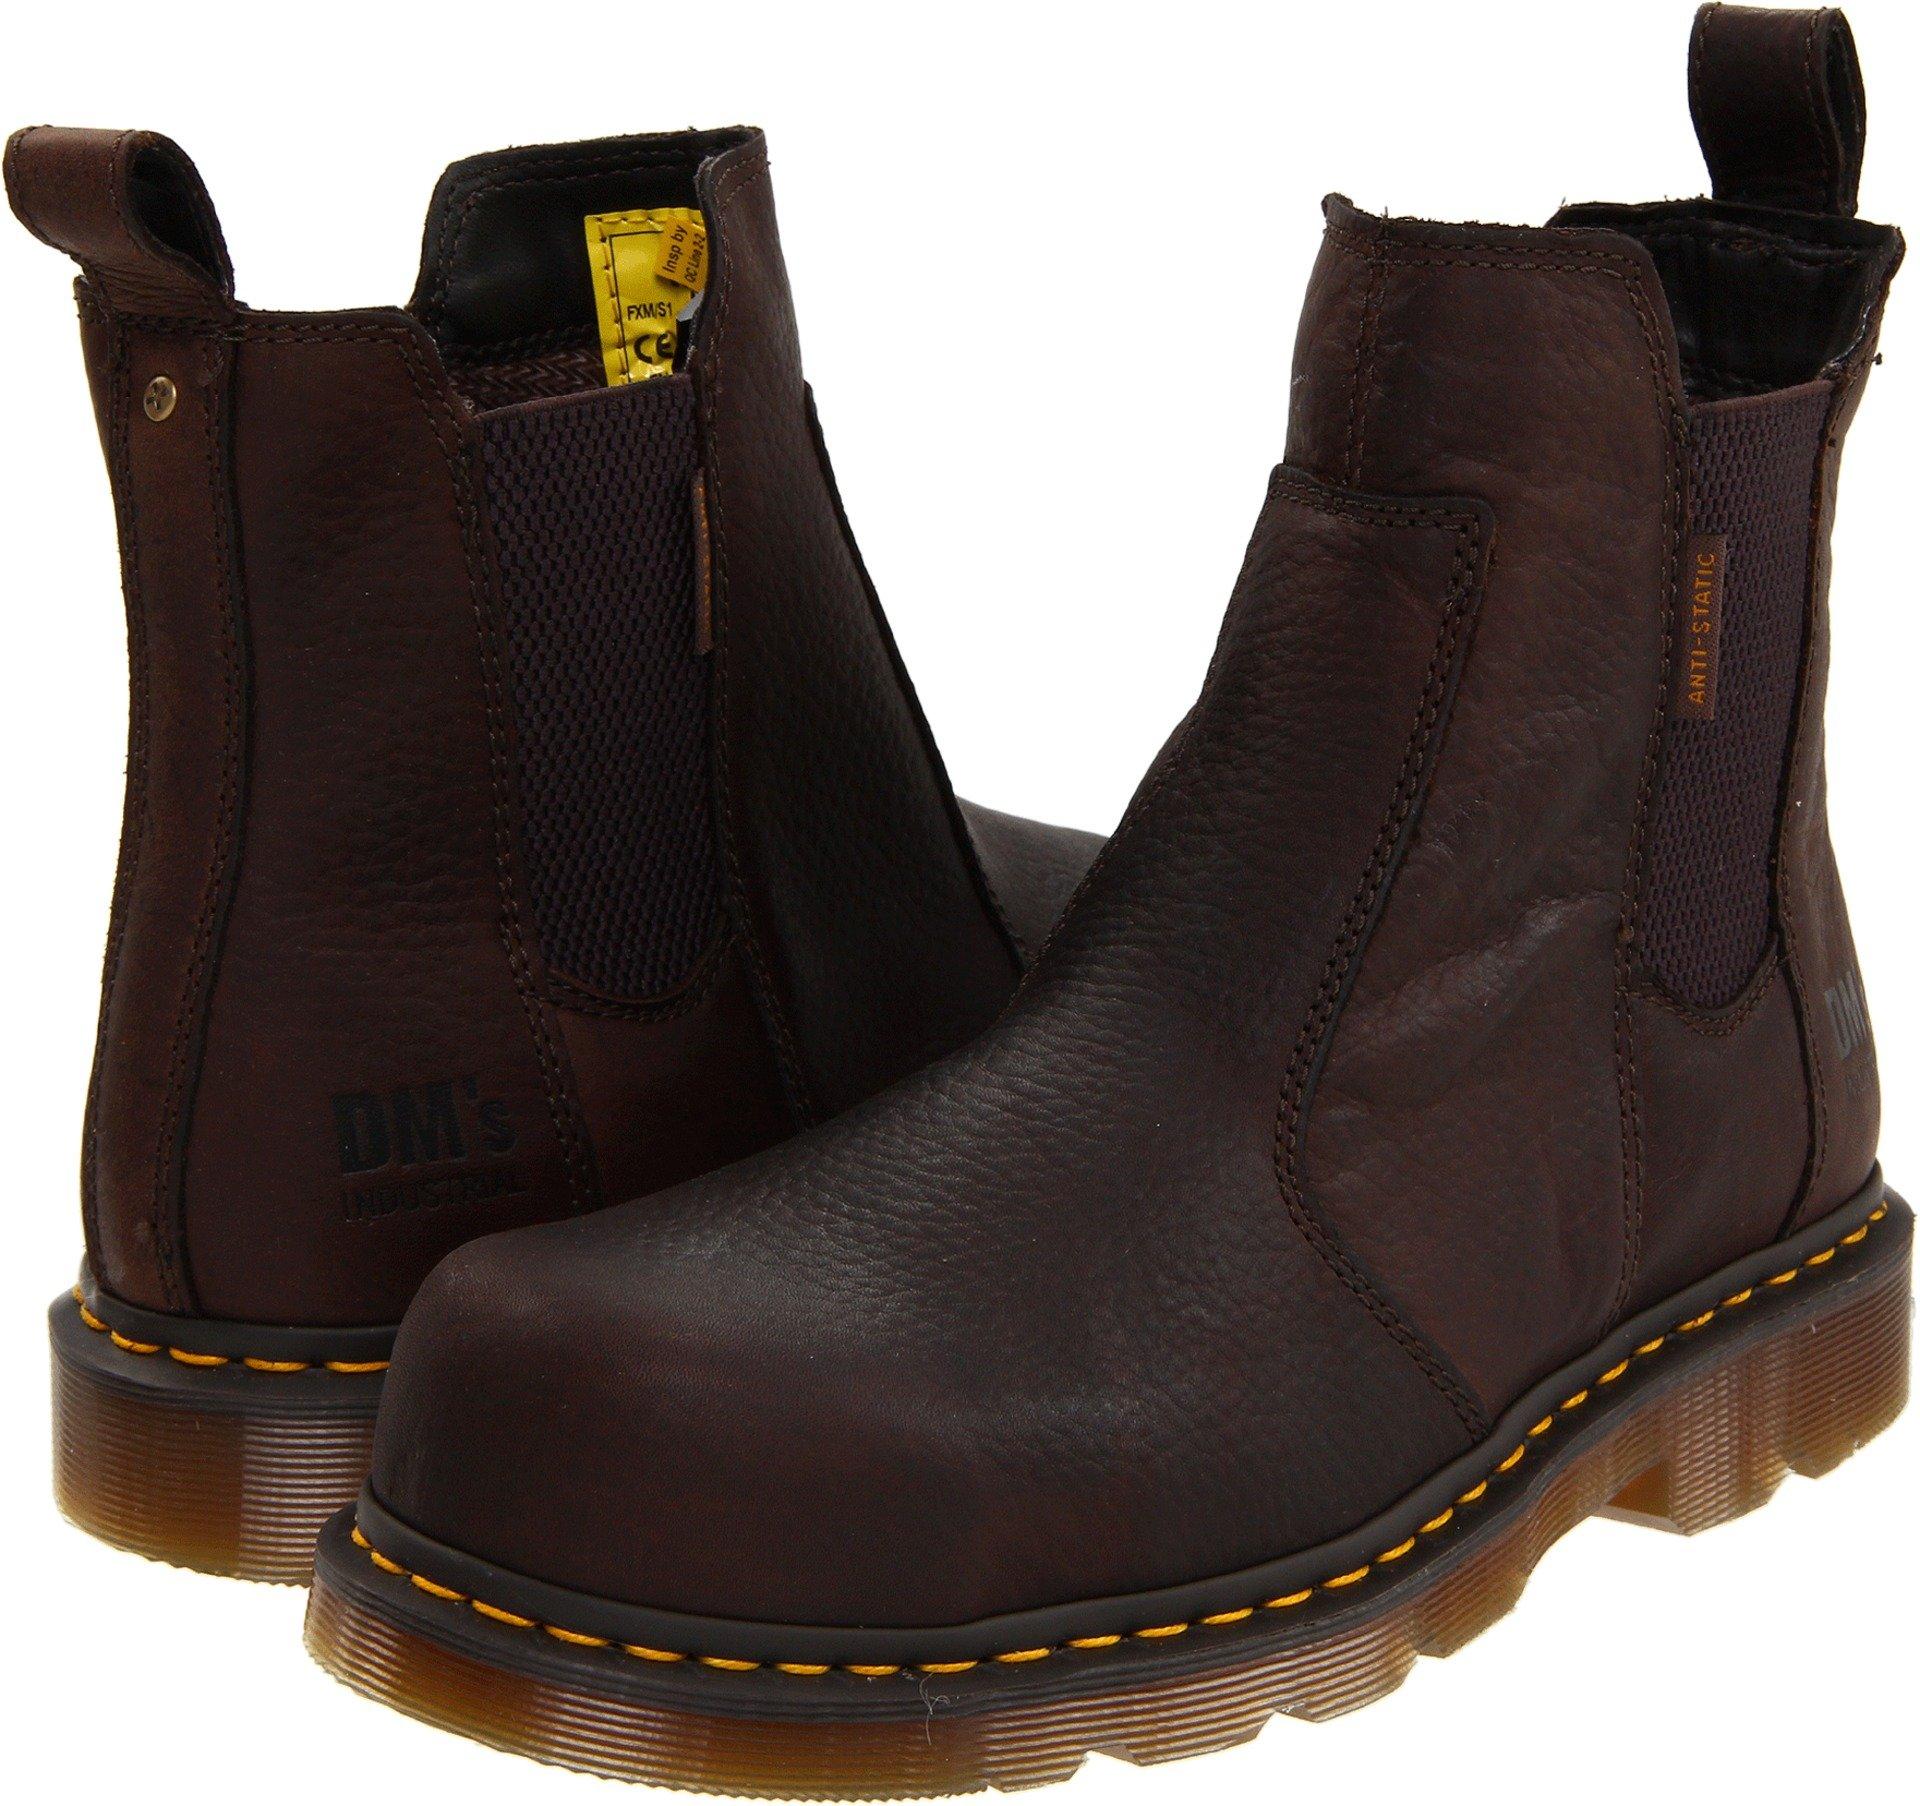 Dr. Martens Men's Fusion Safety Toe Chelsea Boot,Bark,11 UK/12 M US by Dr. Martens